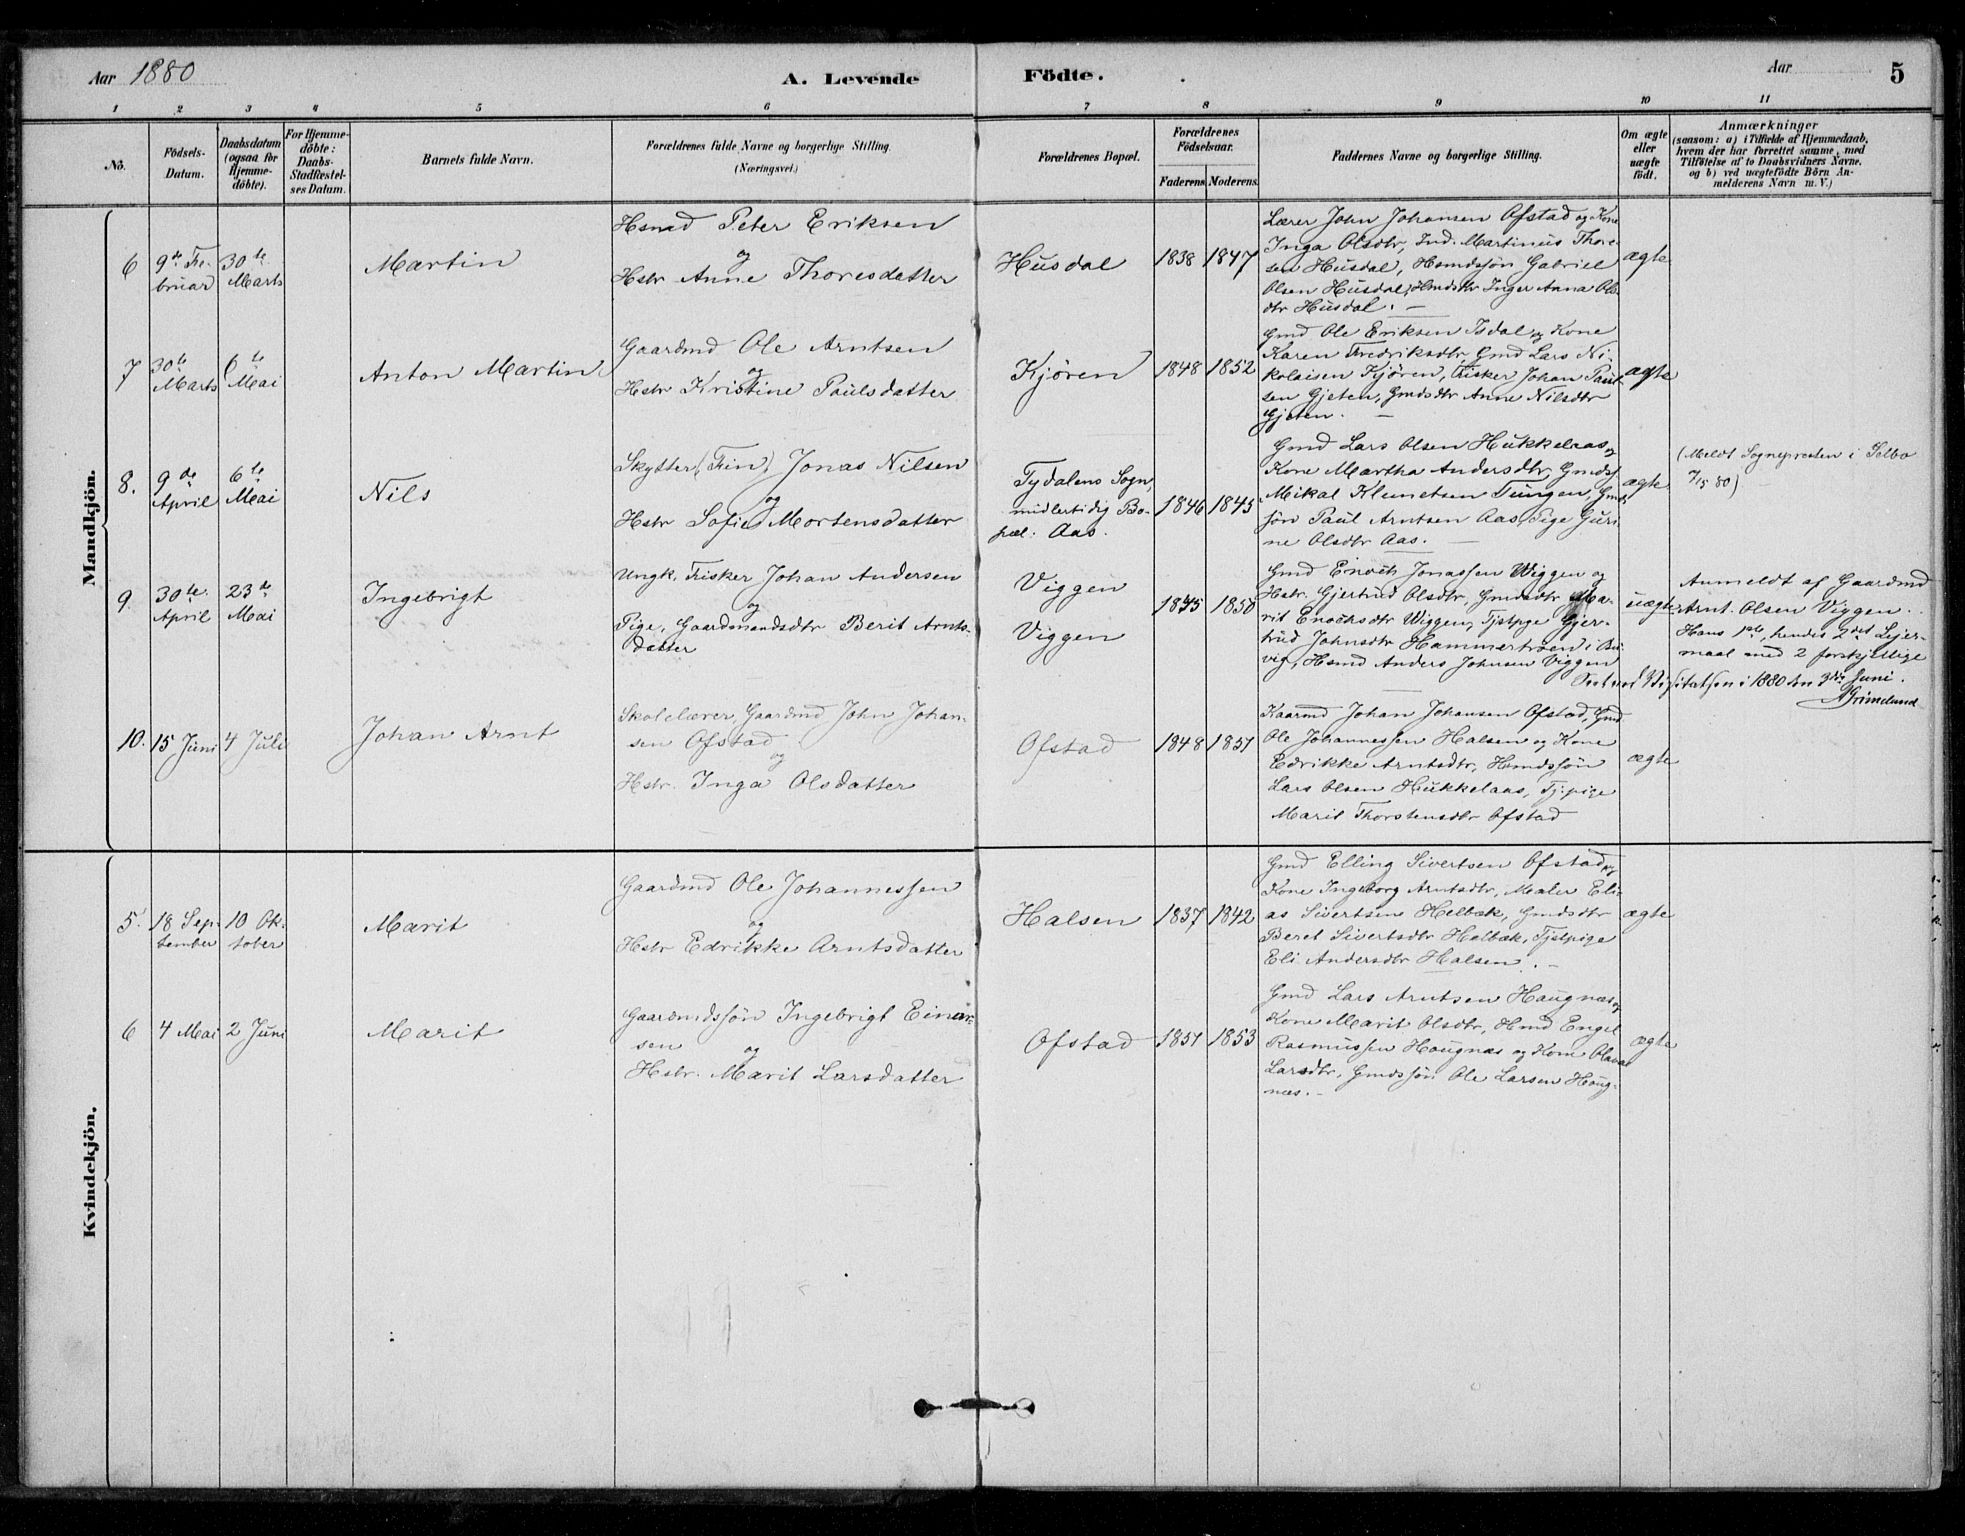 SAT, Ministerialprotokoller, klokkerbøker og fødselsregistre - Sør-Trøndelag, 670/L0836: Parish register (official) no. 670A01, 1879-1904, p. 5